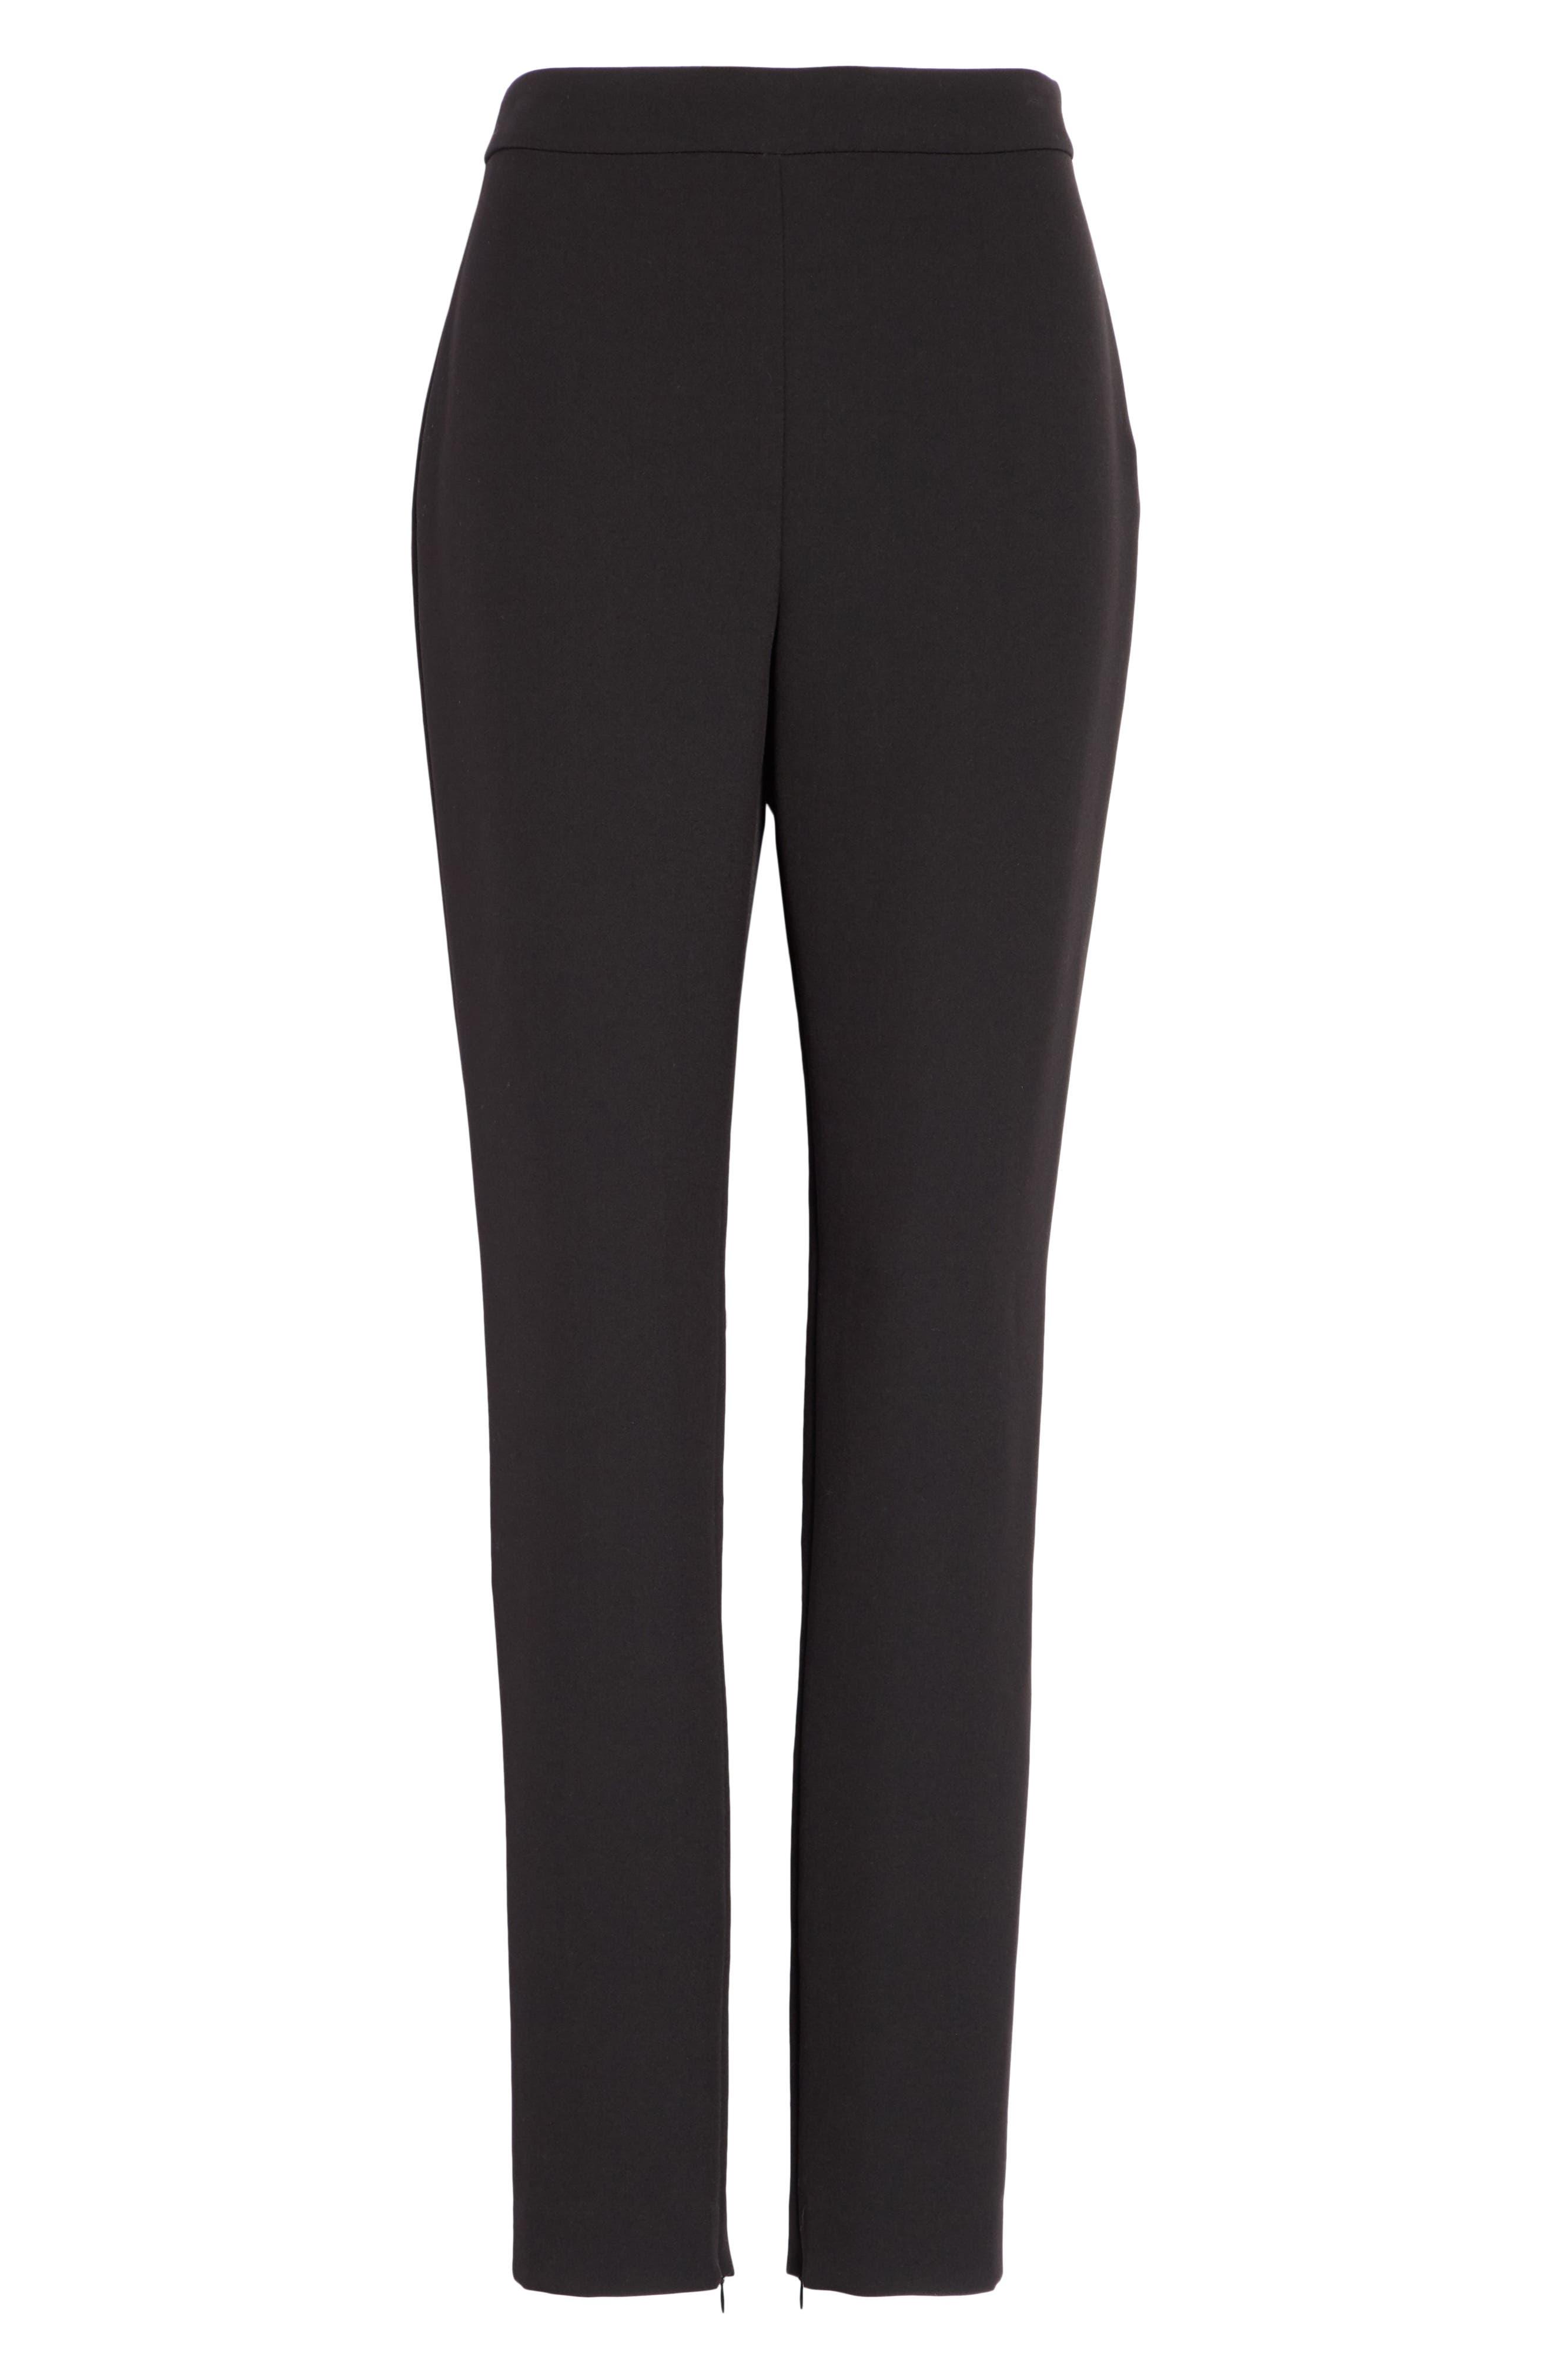 Bella Double Weave Skinny Pants,                             Alternate thumbnail 7, color,                             CAVIAR